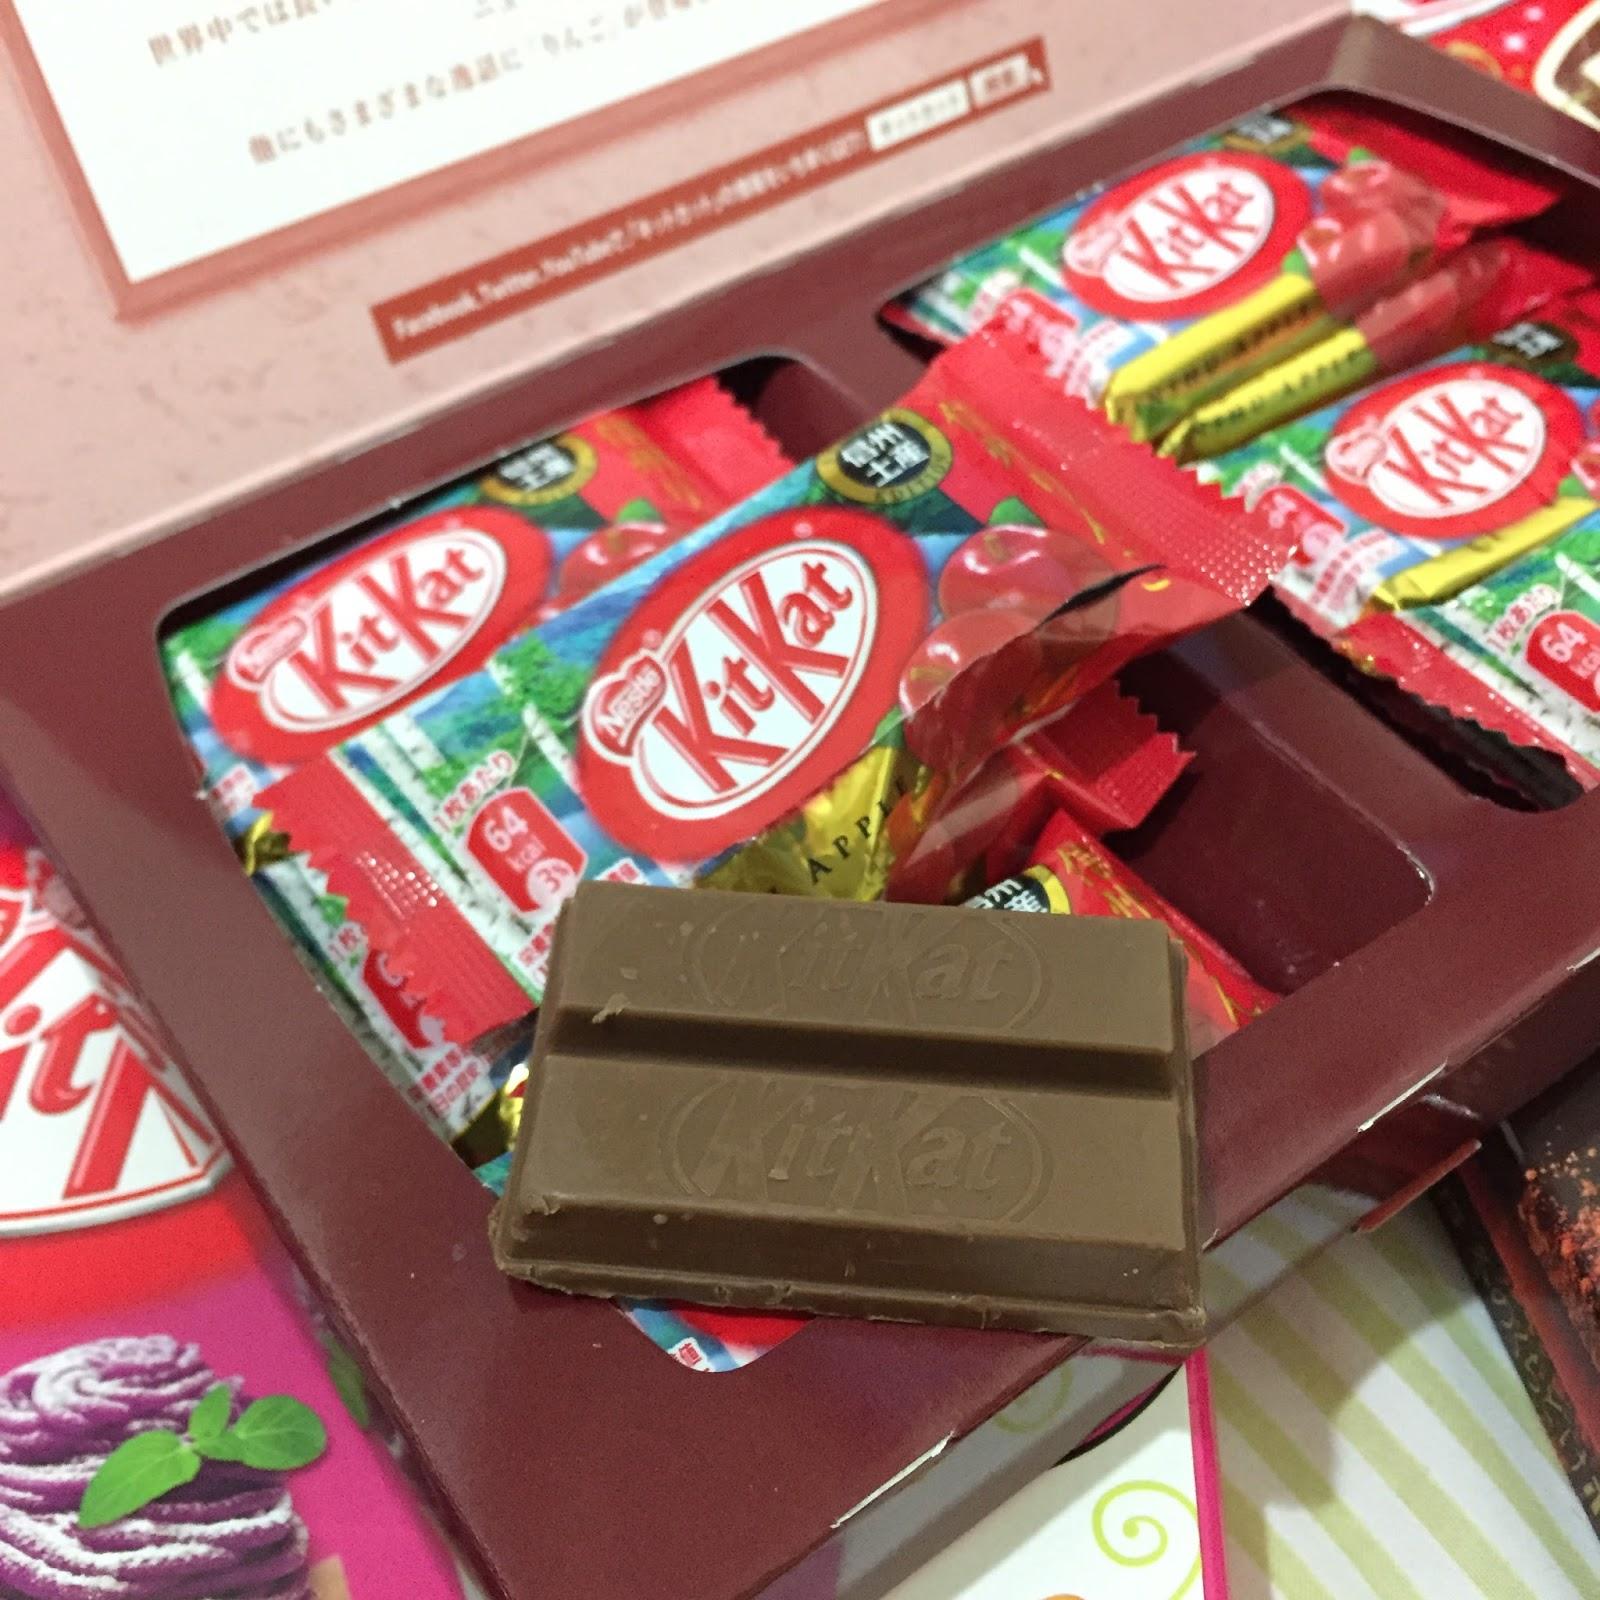 Macam macam rasa KitKat